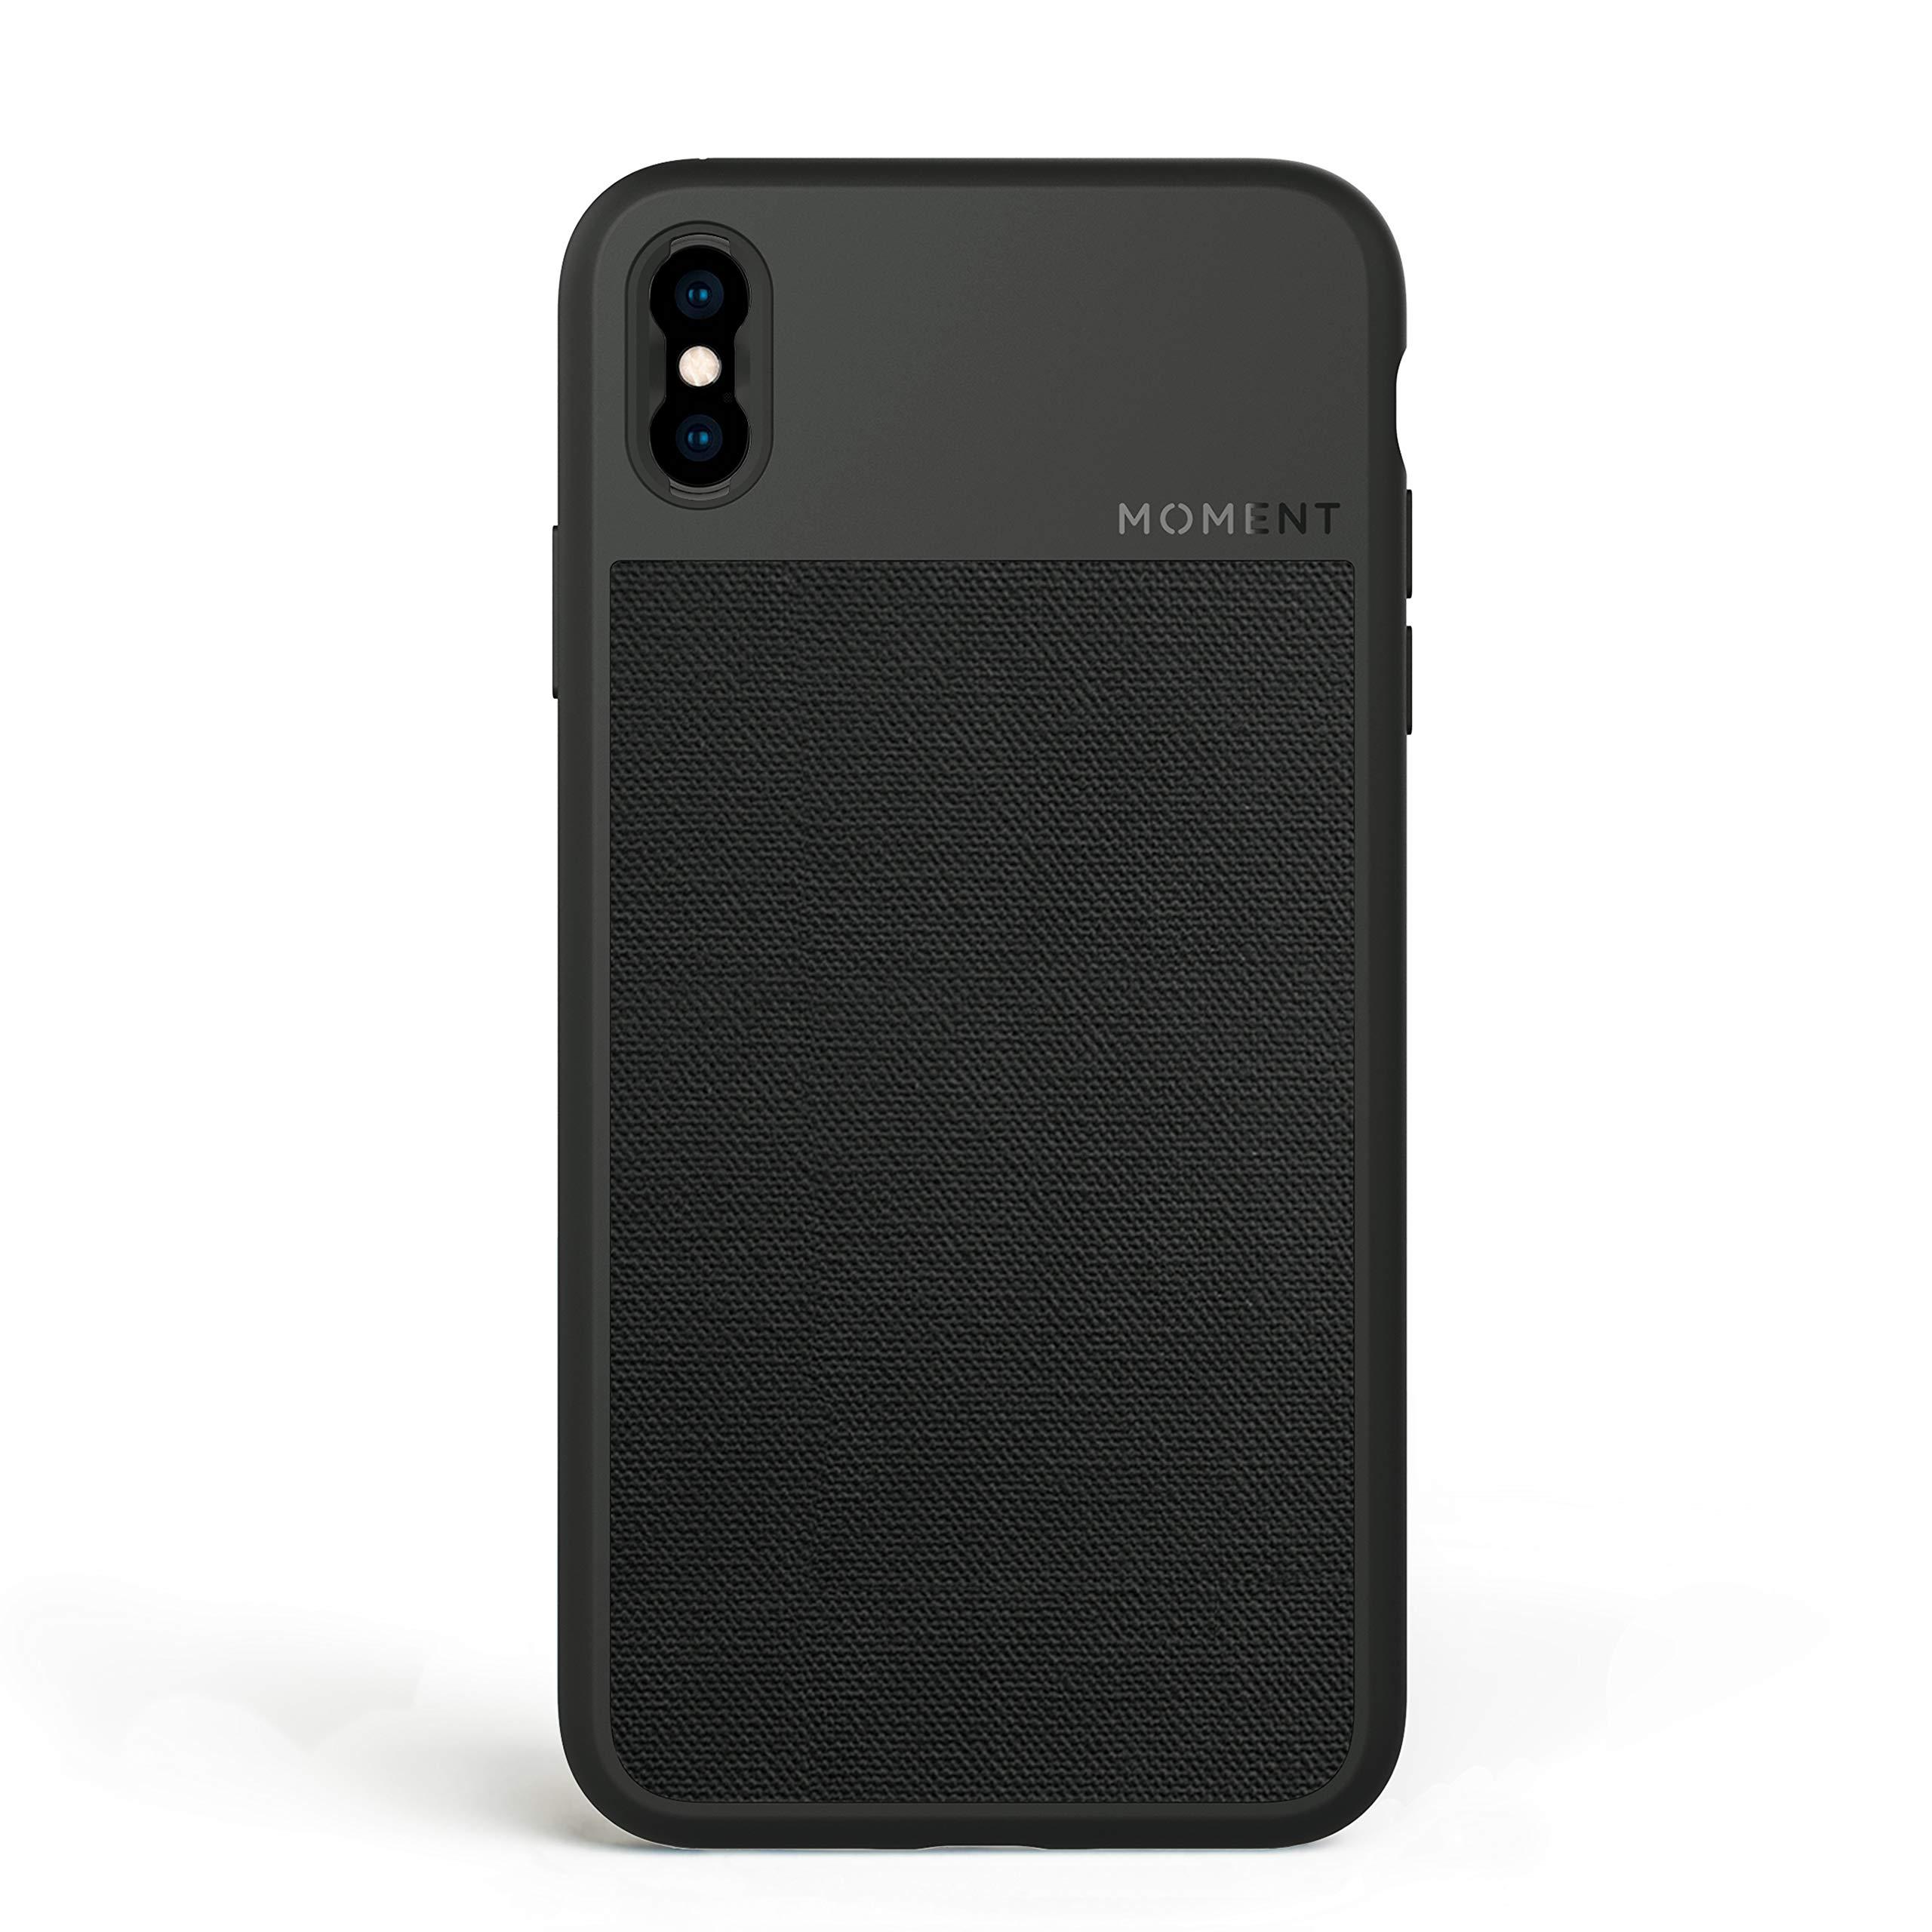 ویکالا · خرید  اصل اورجینال · خرید از آمازون · iPhone Xs Max Case    Moment Photo Case in Black Canvas - Thin, Protective, Wrist Strap Friendly case for Camera Lovers. wekala · ویکالا